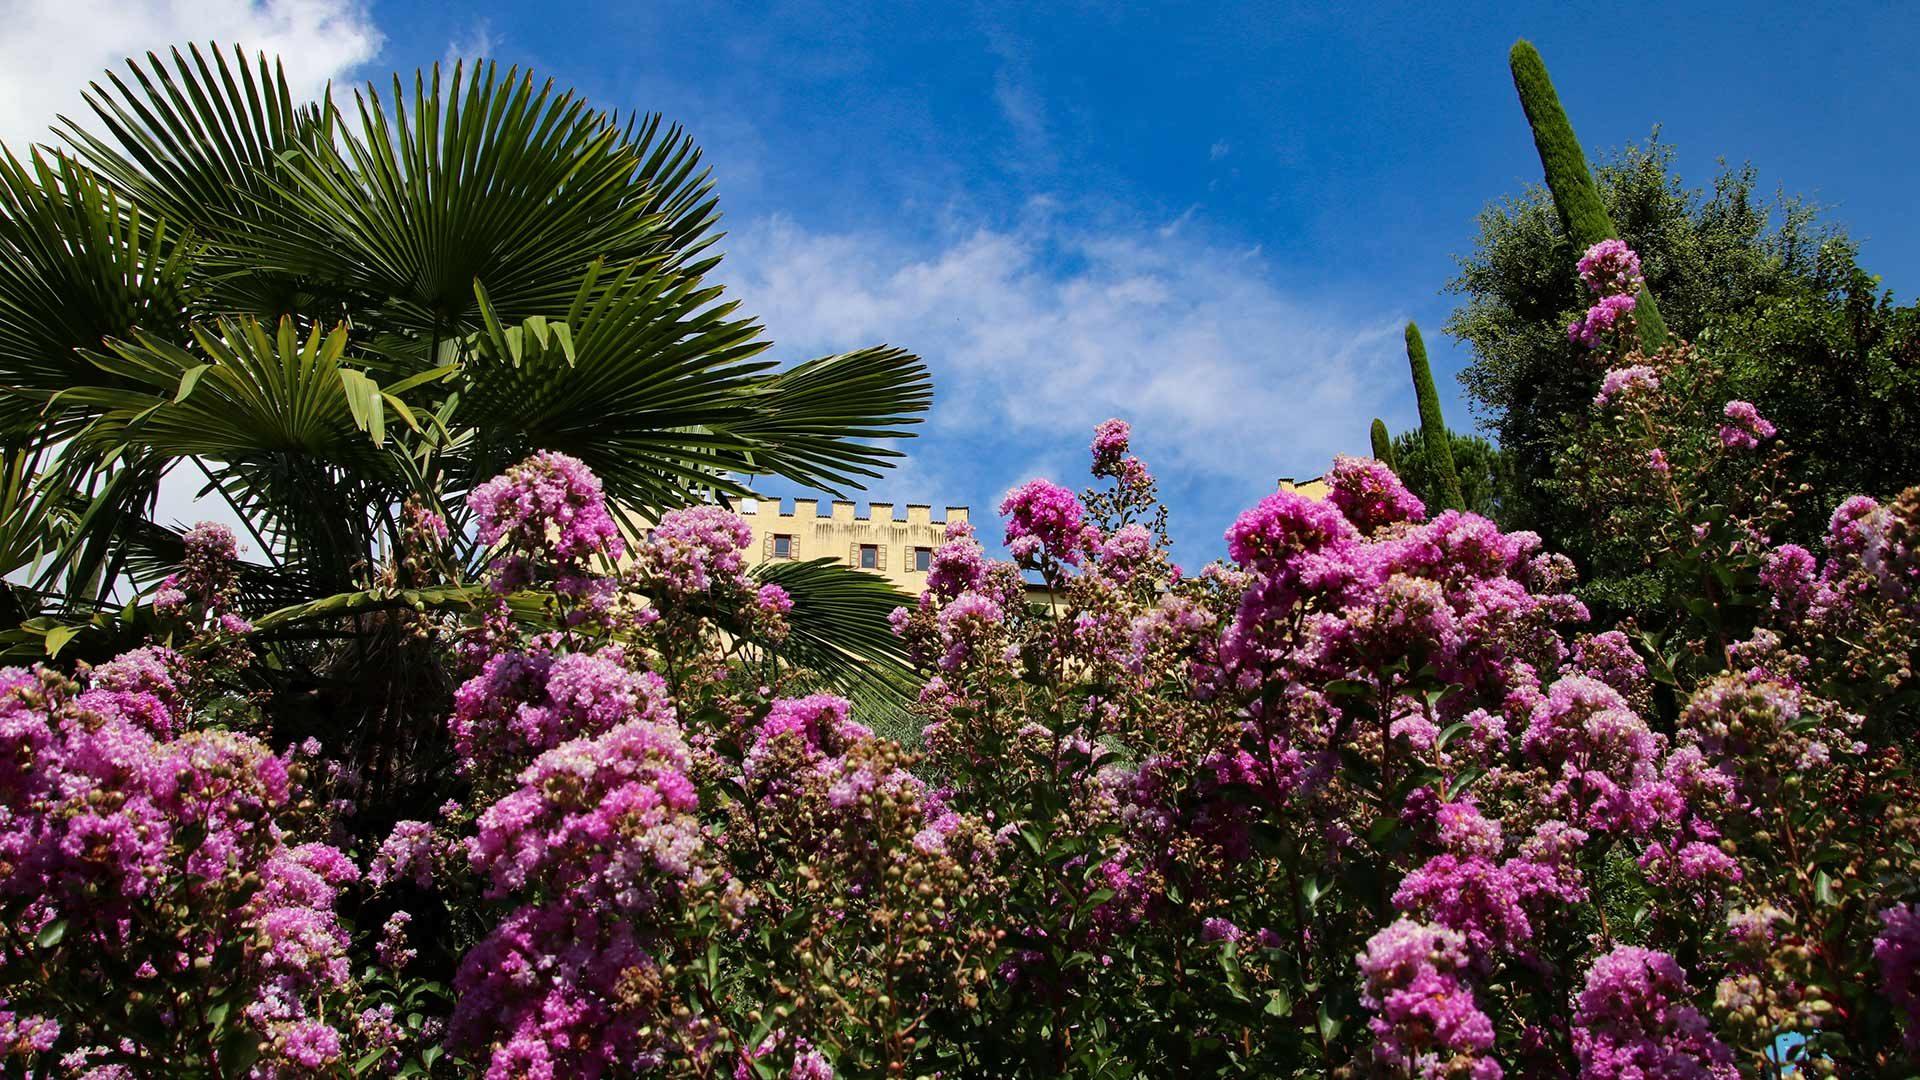 Merano - Giardini di Castel Trauttmansdorff